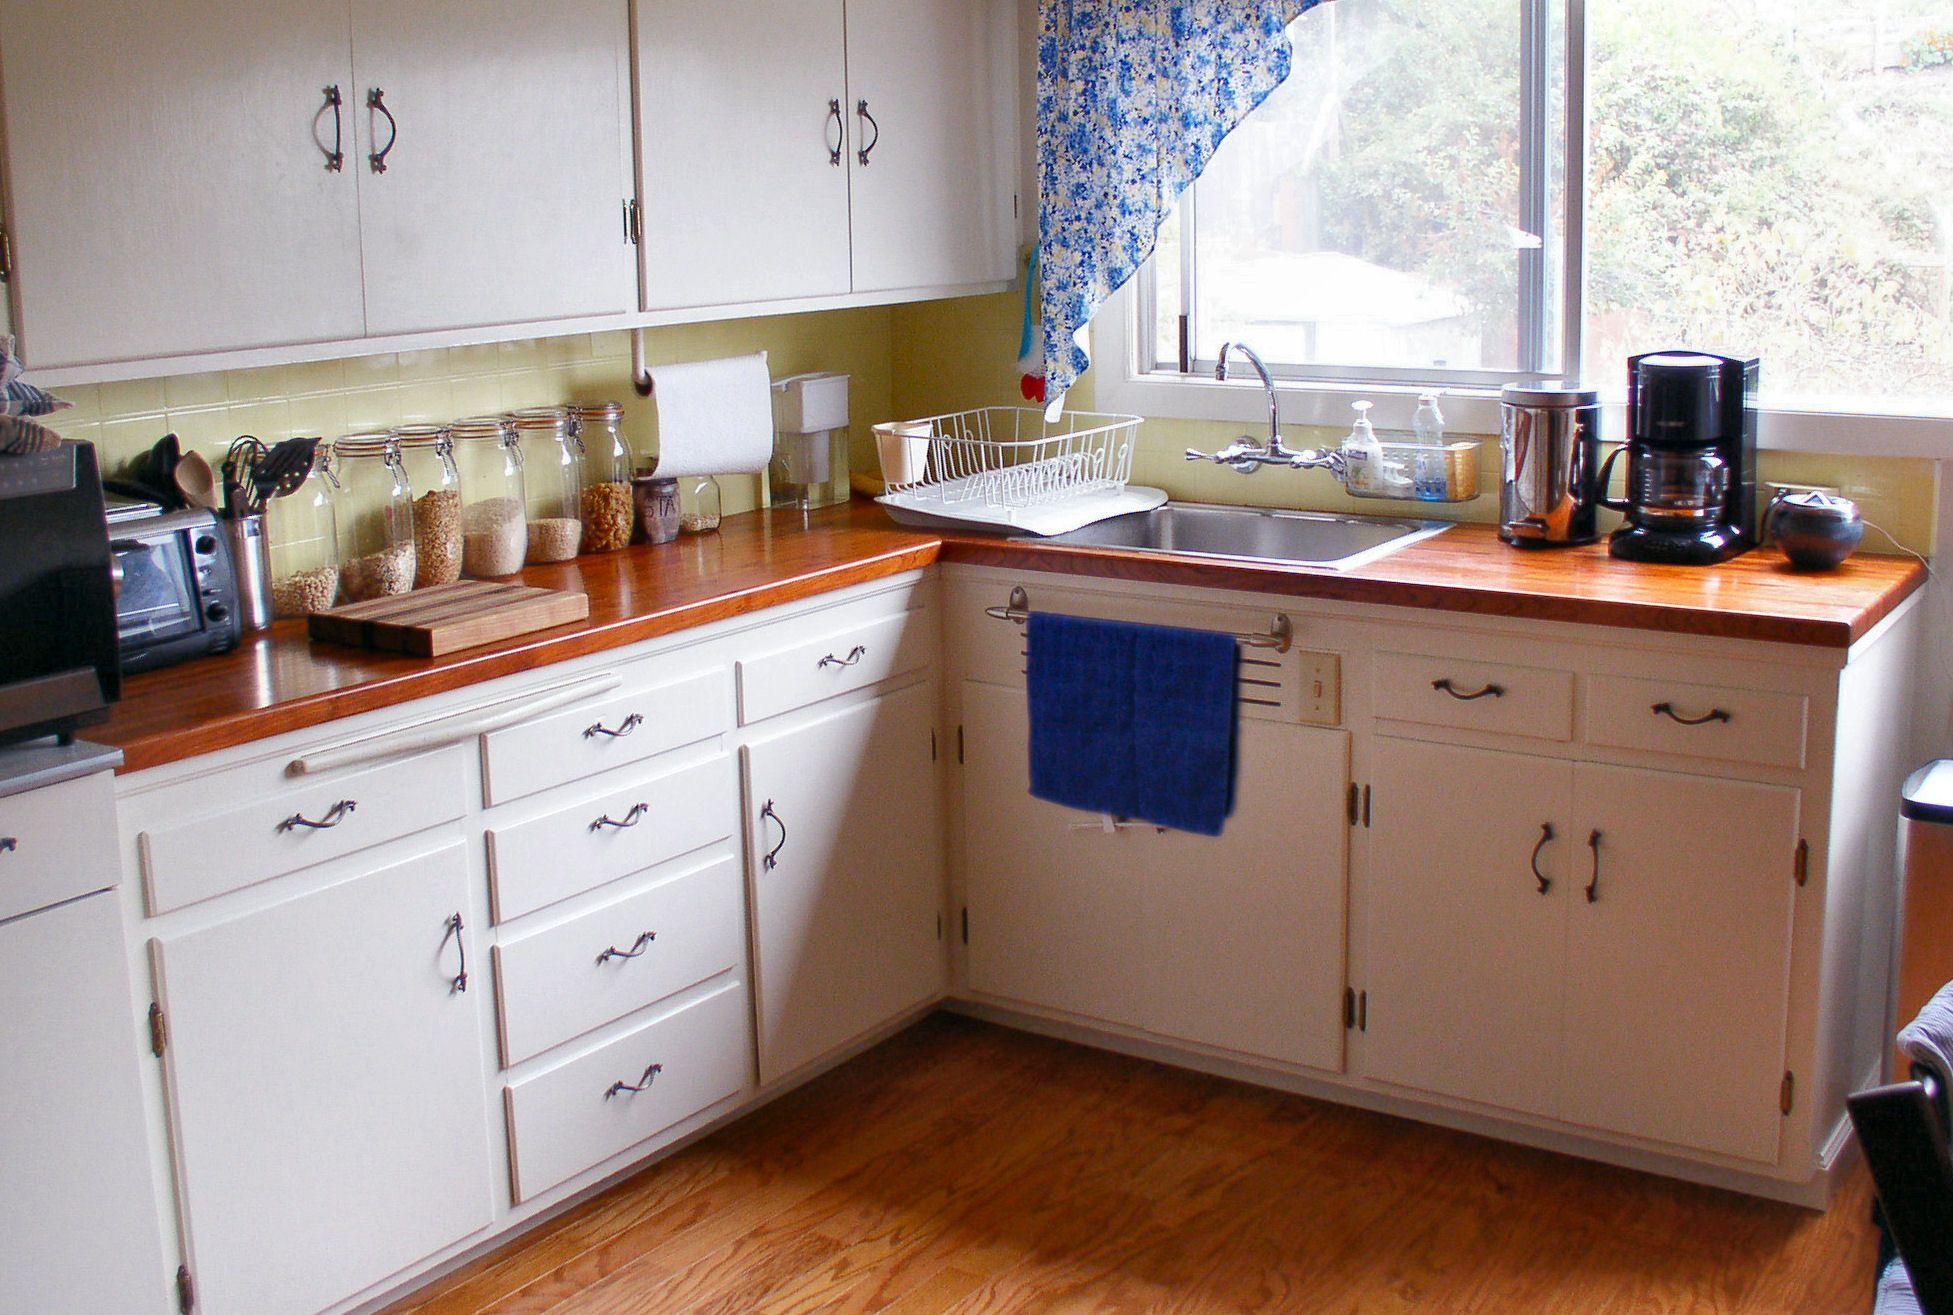 DeVos Custom Woodworking - Mesquite Wood Countertop Photo Gallery ...